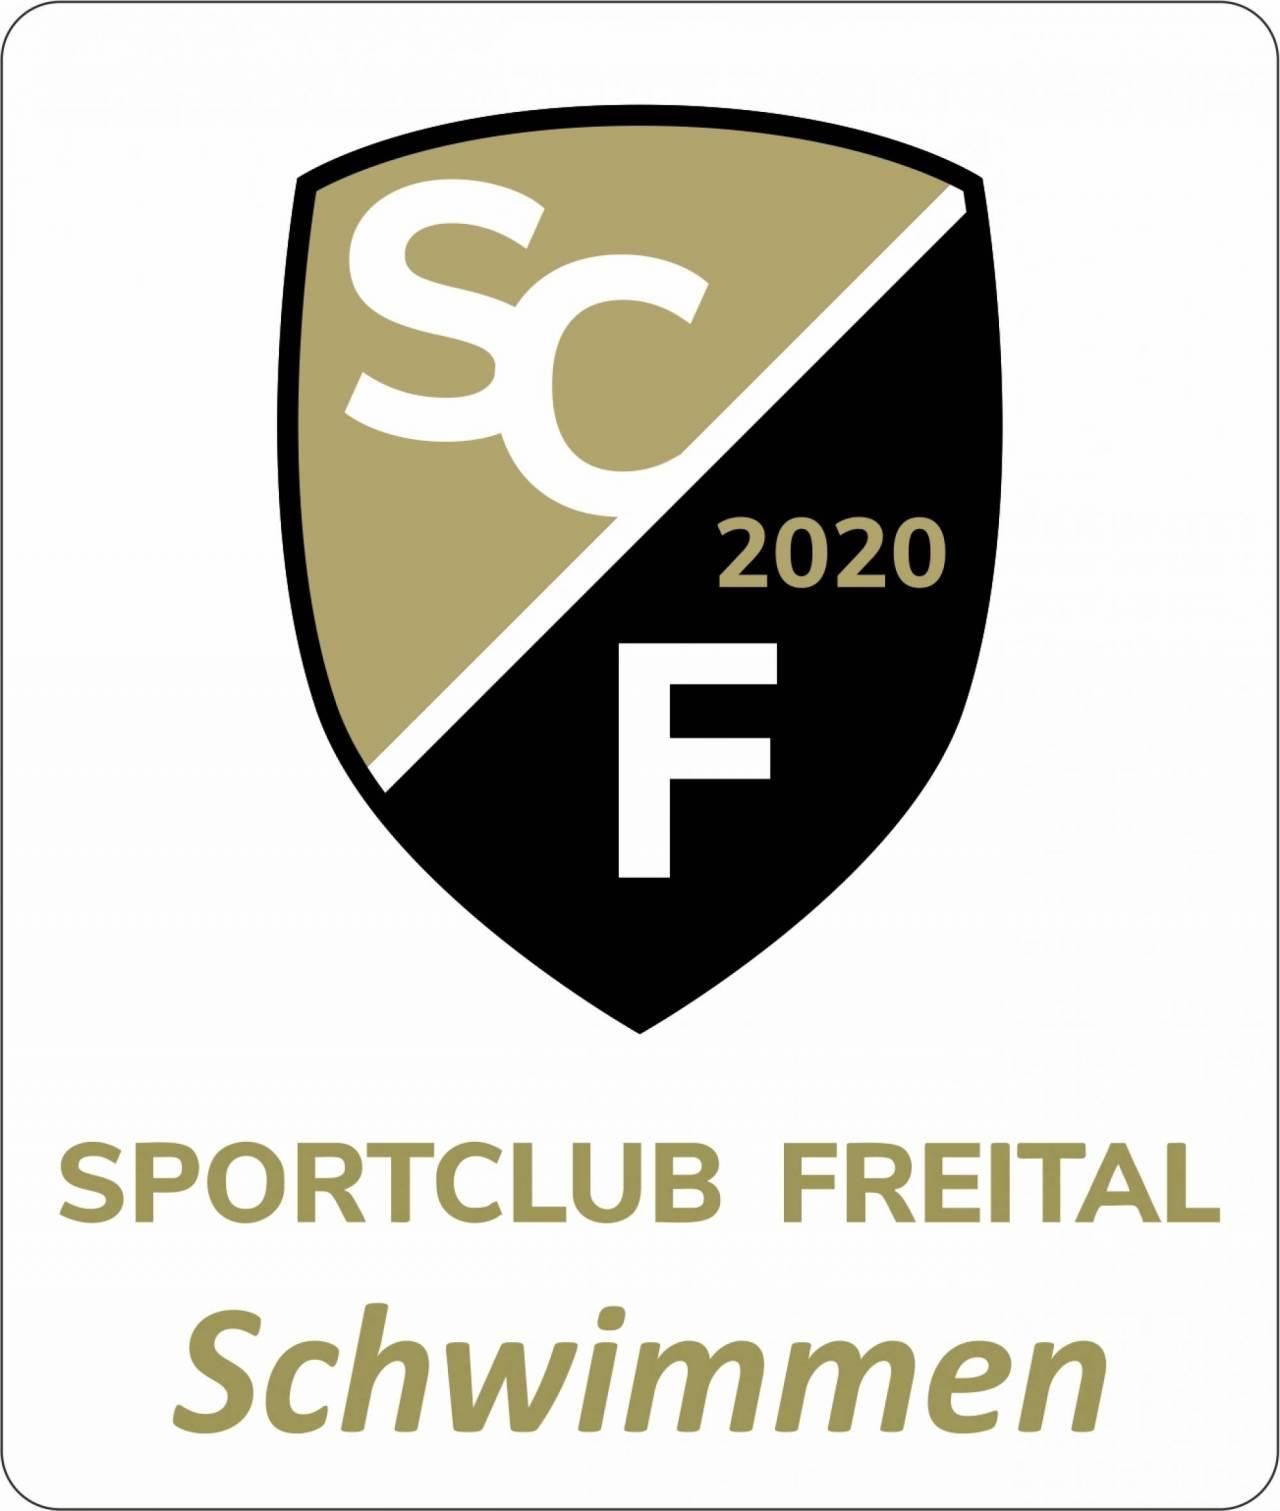 Aufkleber - SC Freital